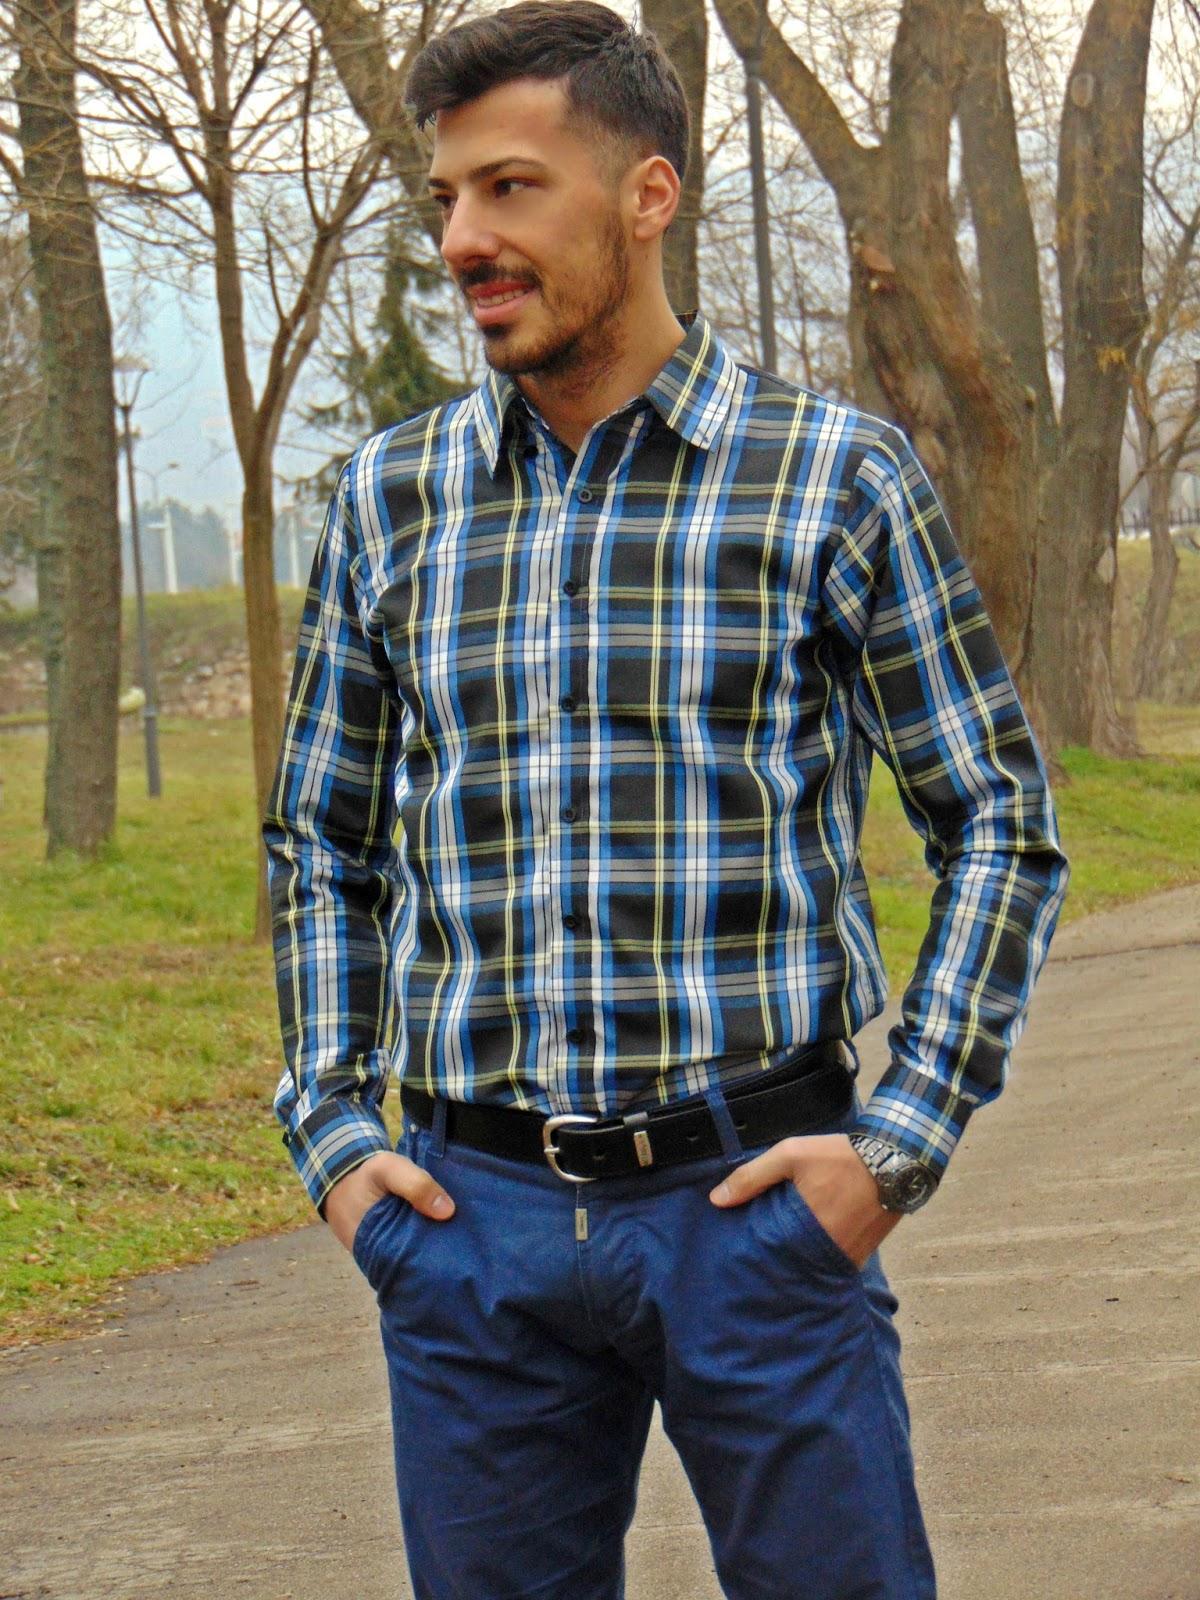 https://www.rosegal.com/mens-shirt/casual-turn-down-collar-classic-color-block-plaid-pattern-long-sleeves-men-s-slimming-shirt-461204.html?lkid=11863099